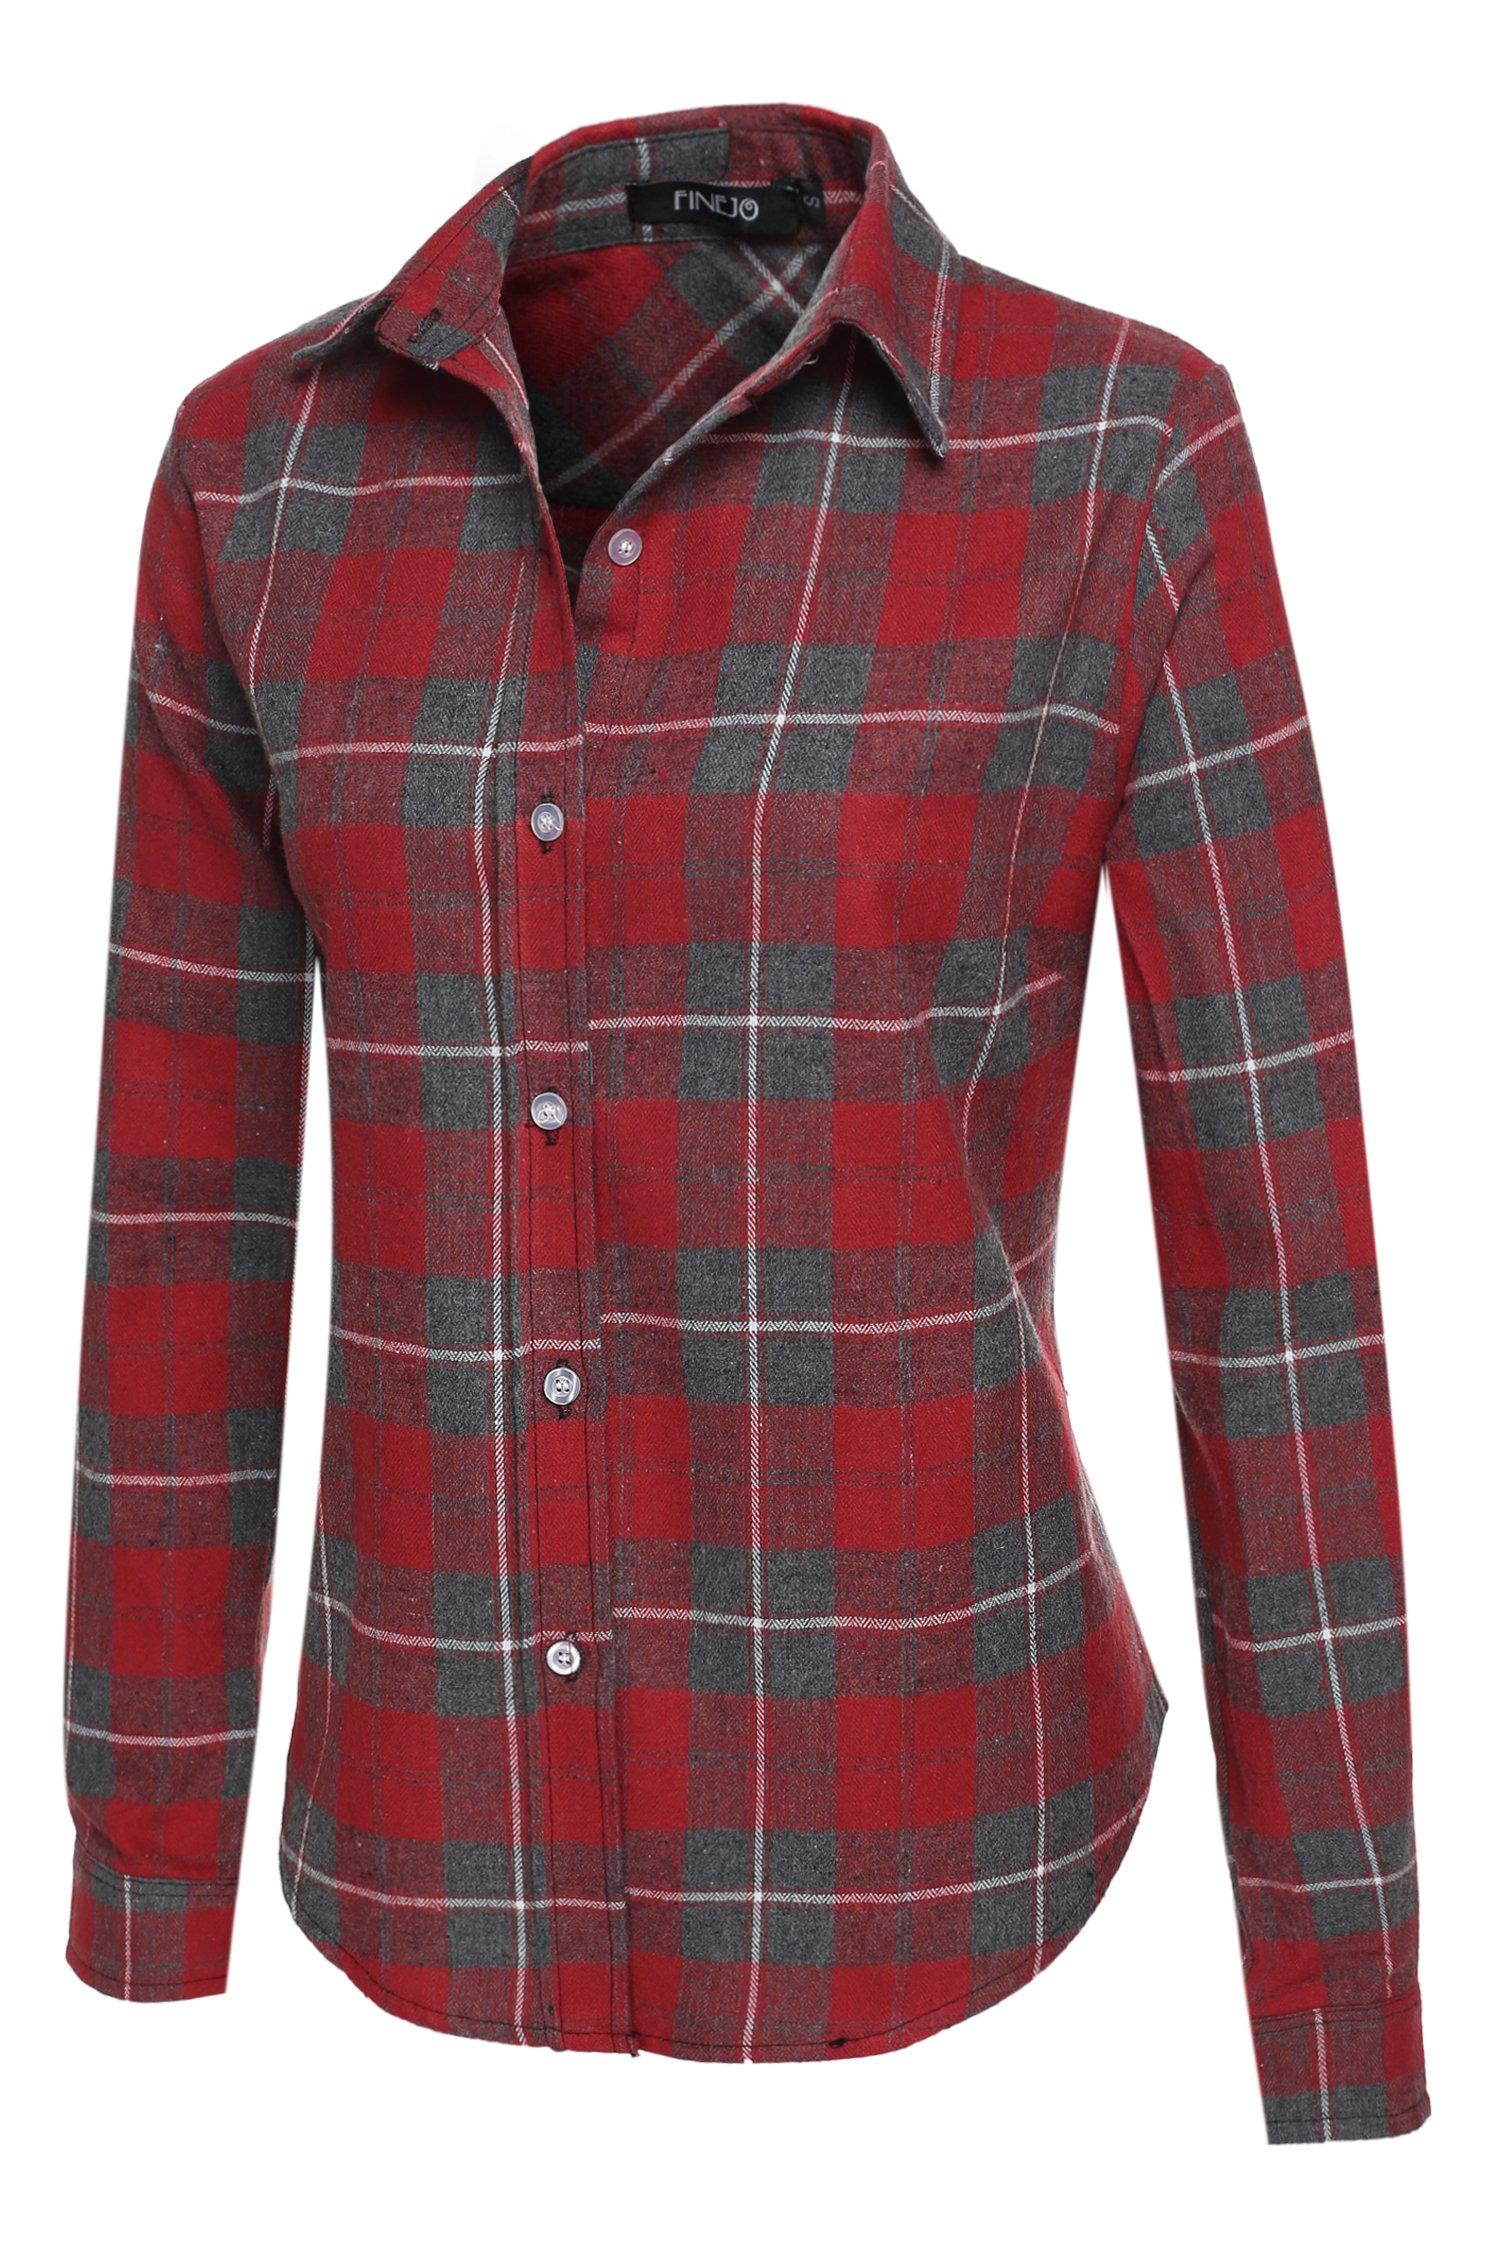 Finejo Women Fashion Casual Turn Down Collar Grid Button Slim Shirt Blouse